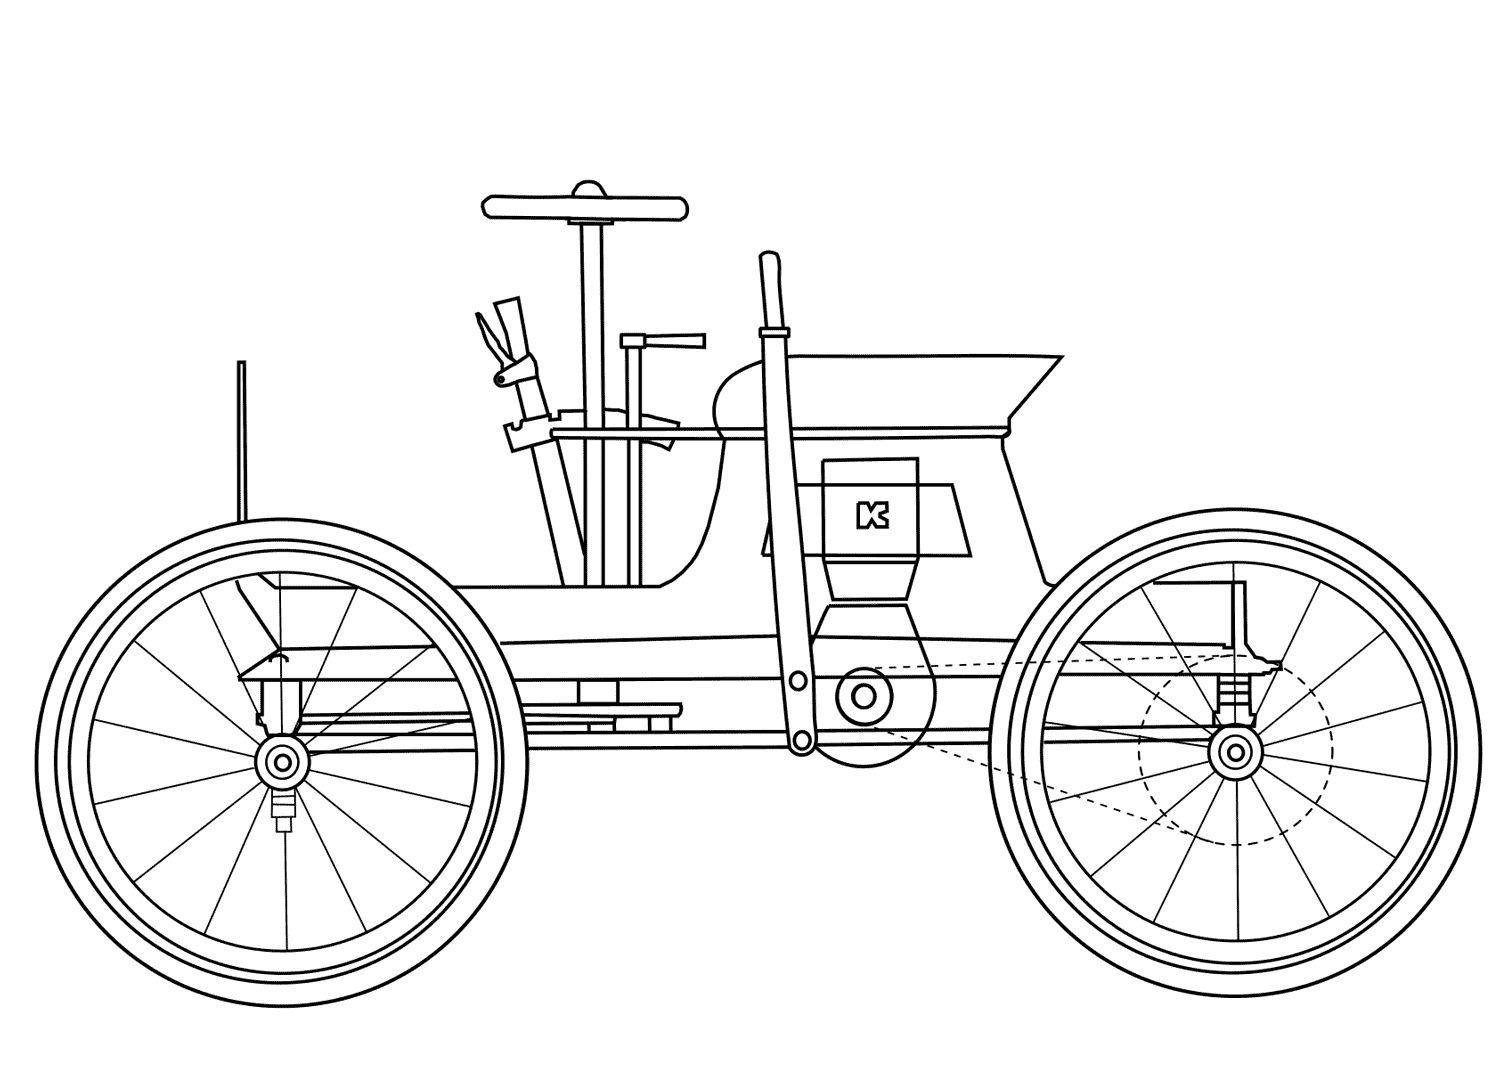 Charles B. King 1893 First Car Design